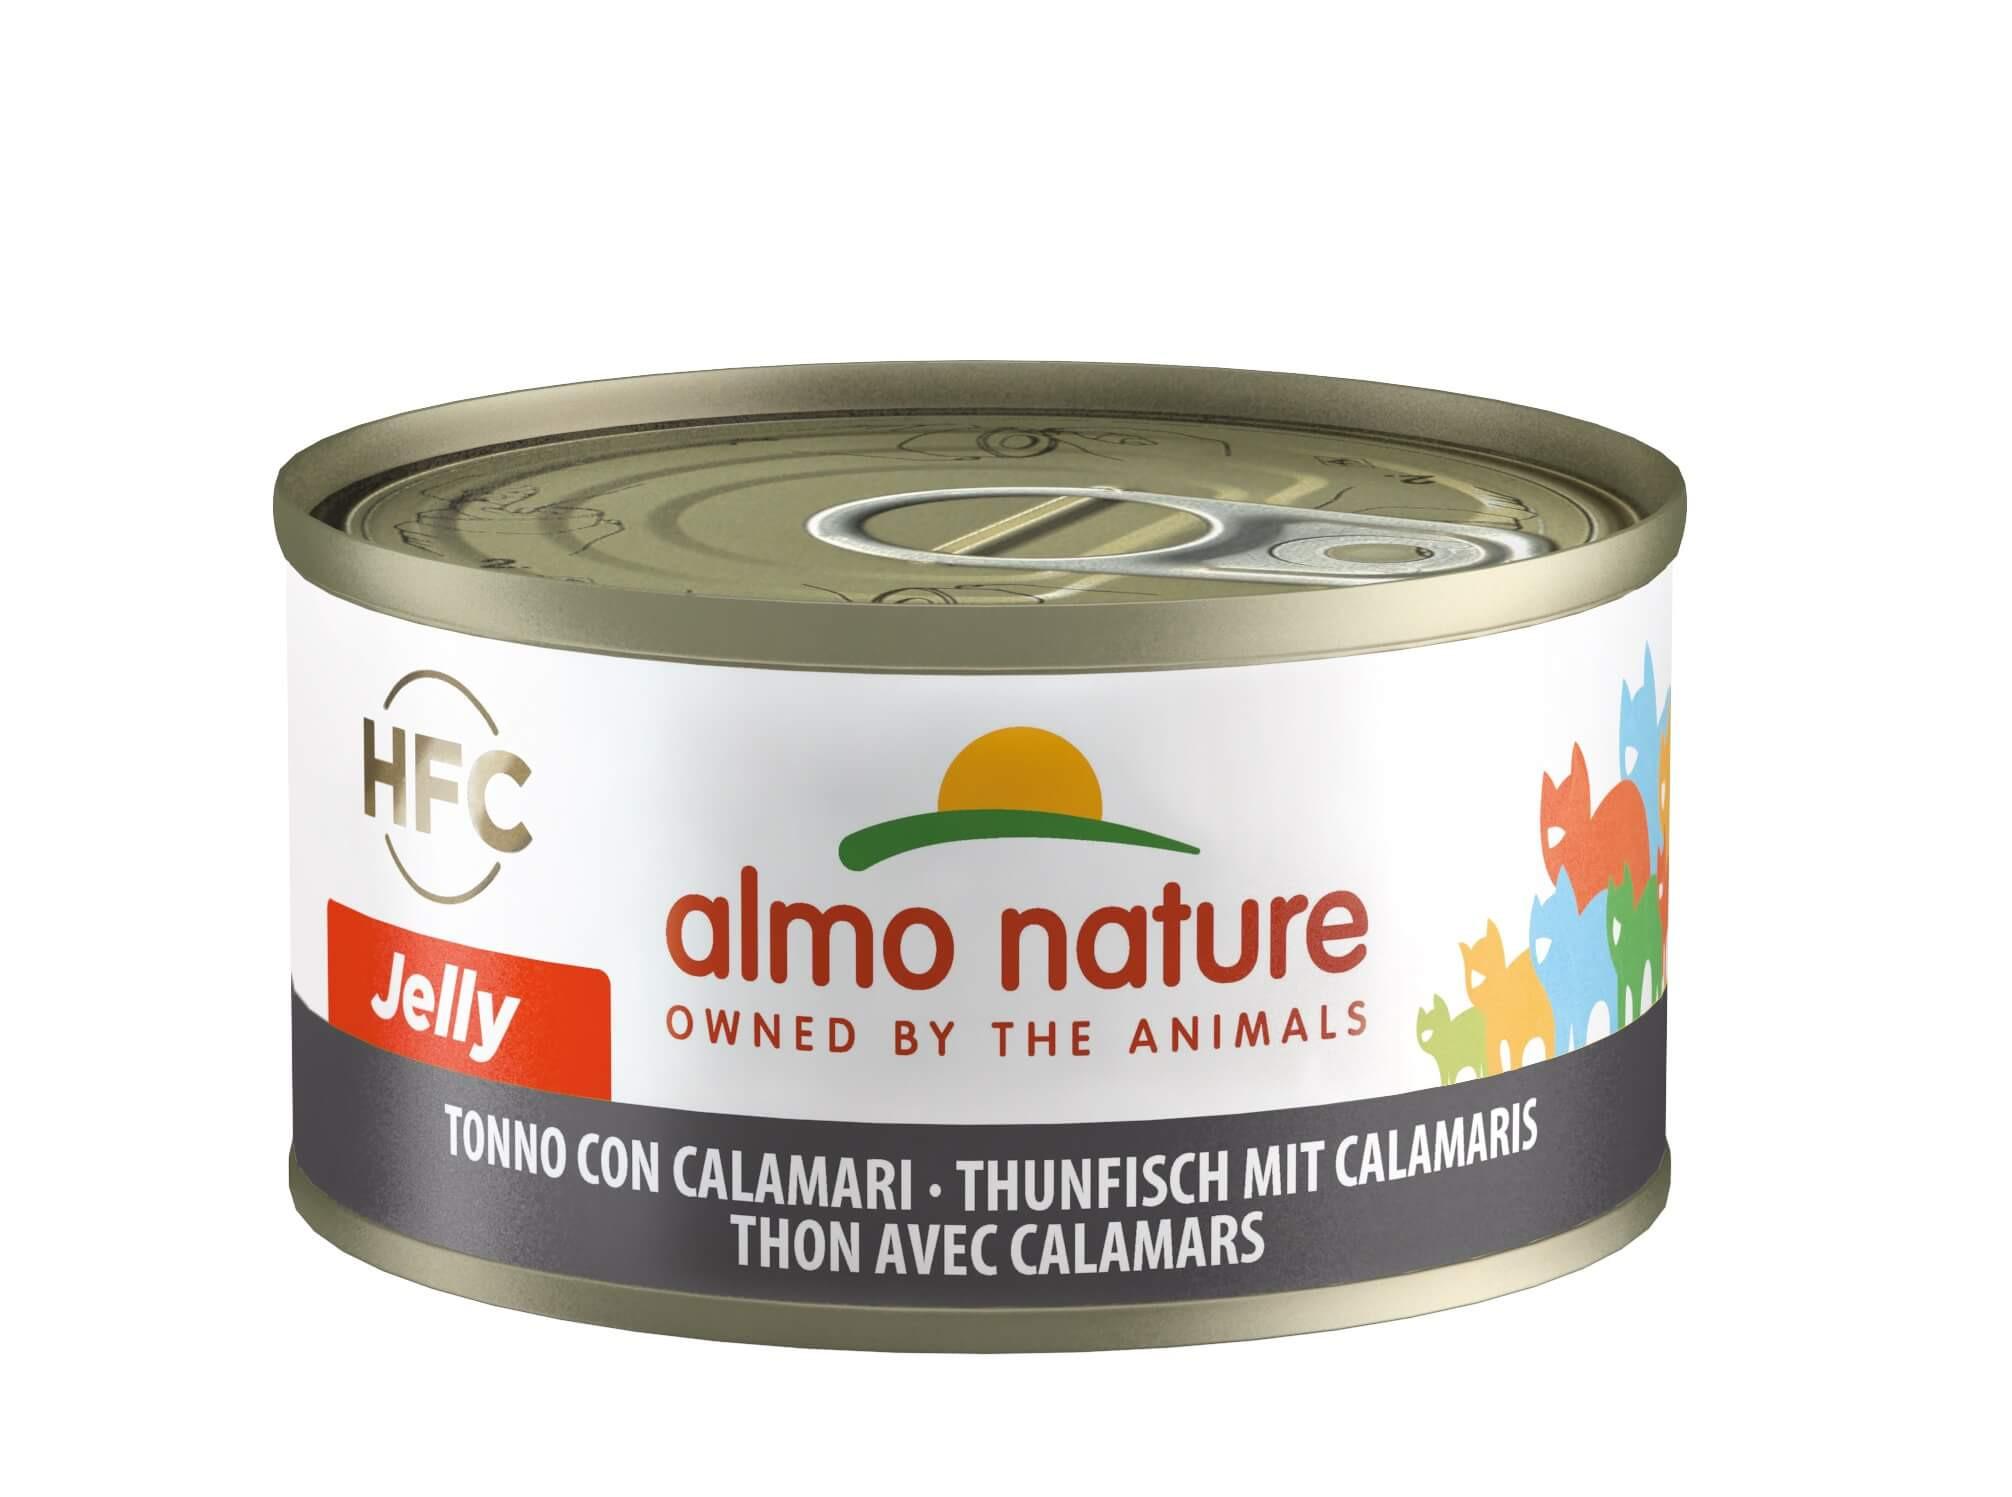 Almo Nature HFC Jelly Thon Calamar nr. 5019H